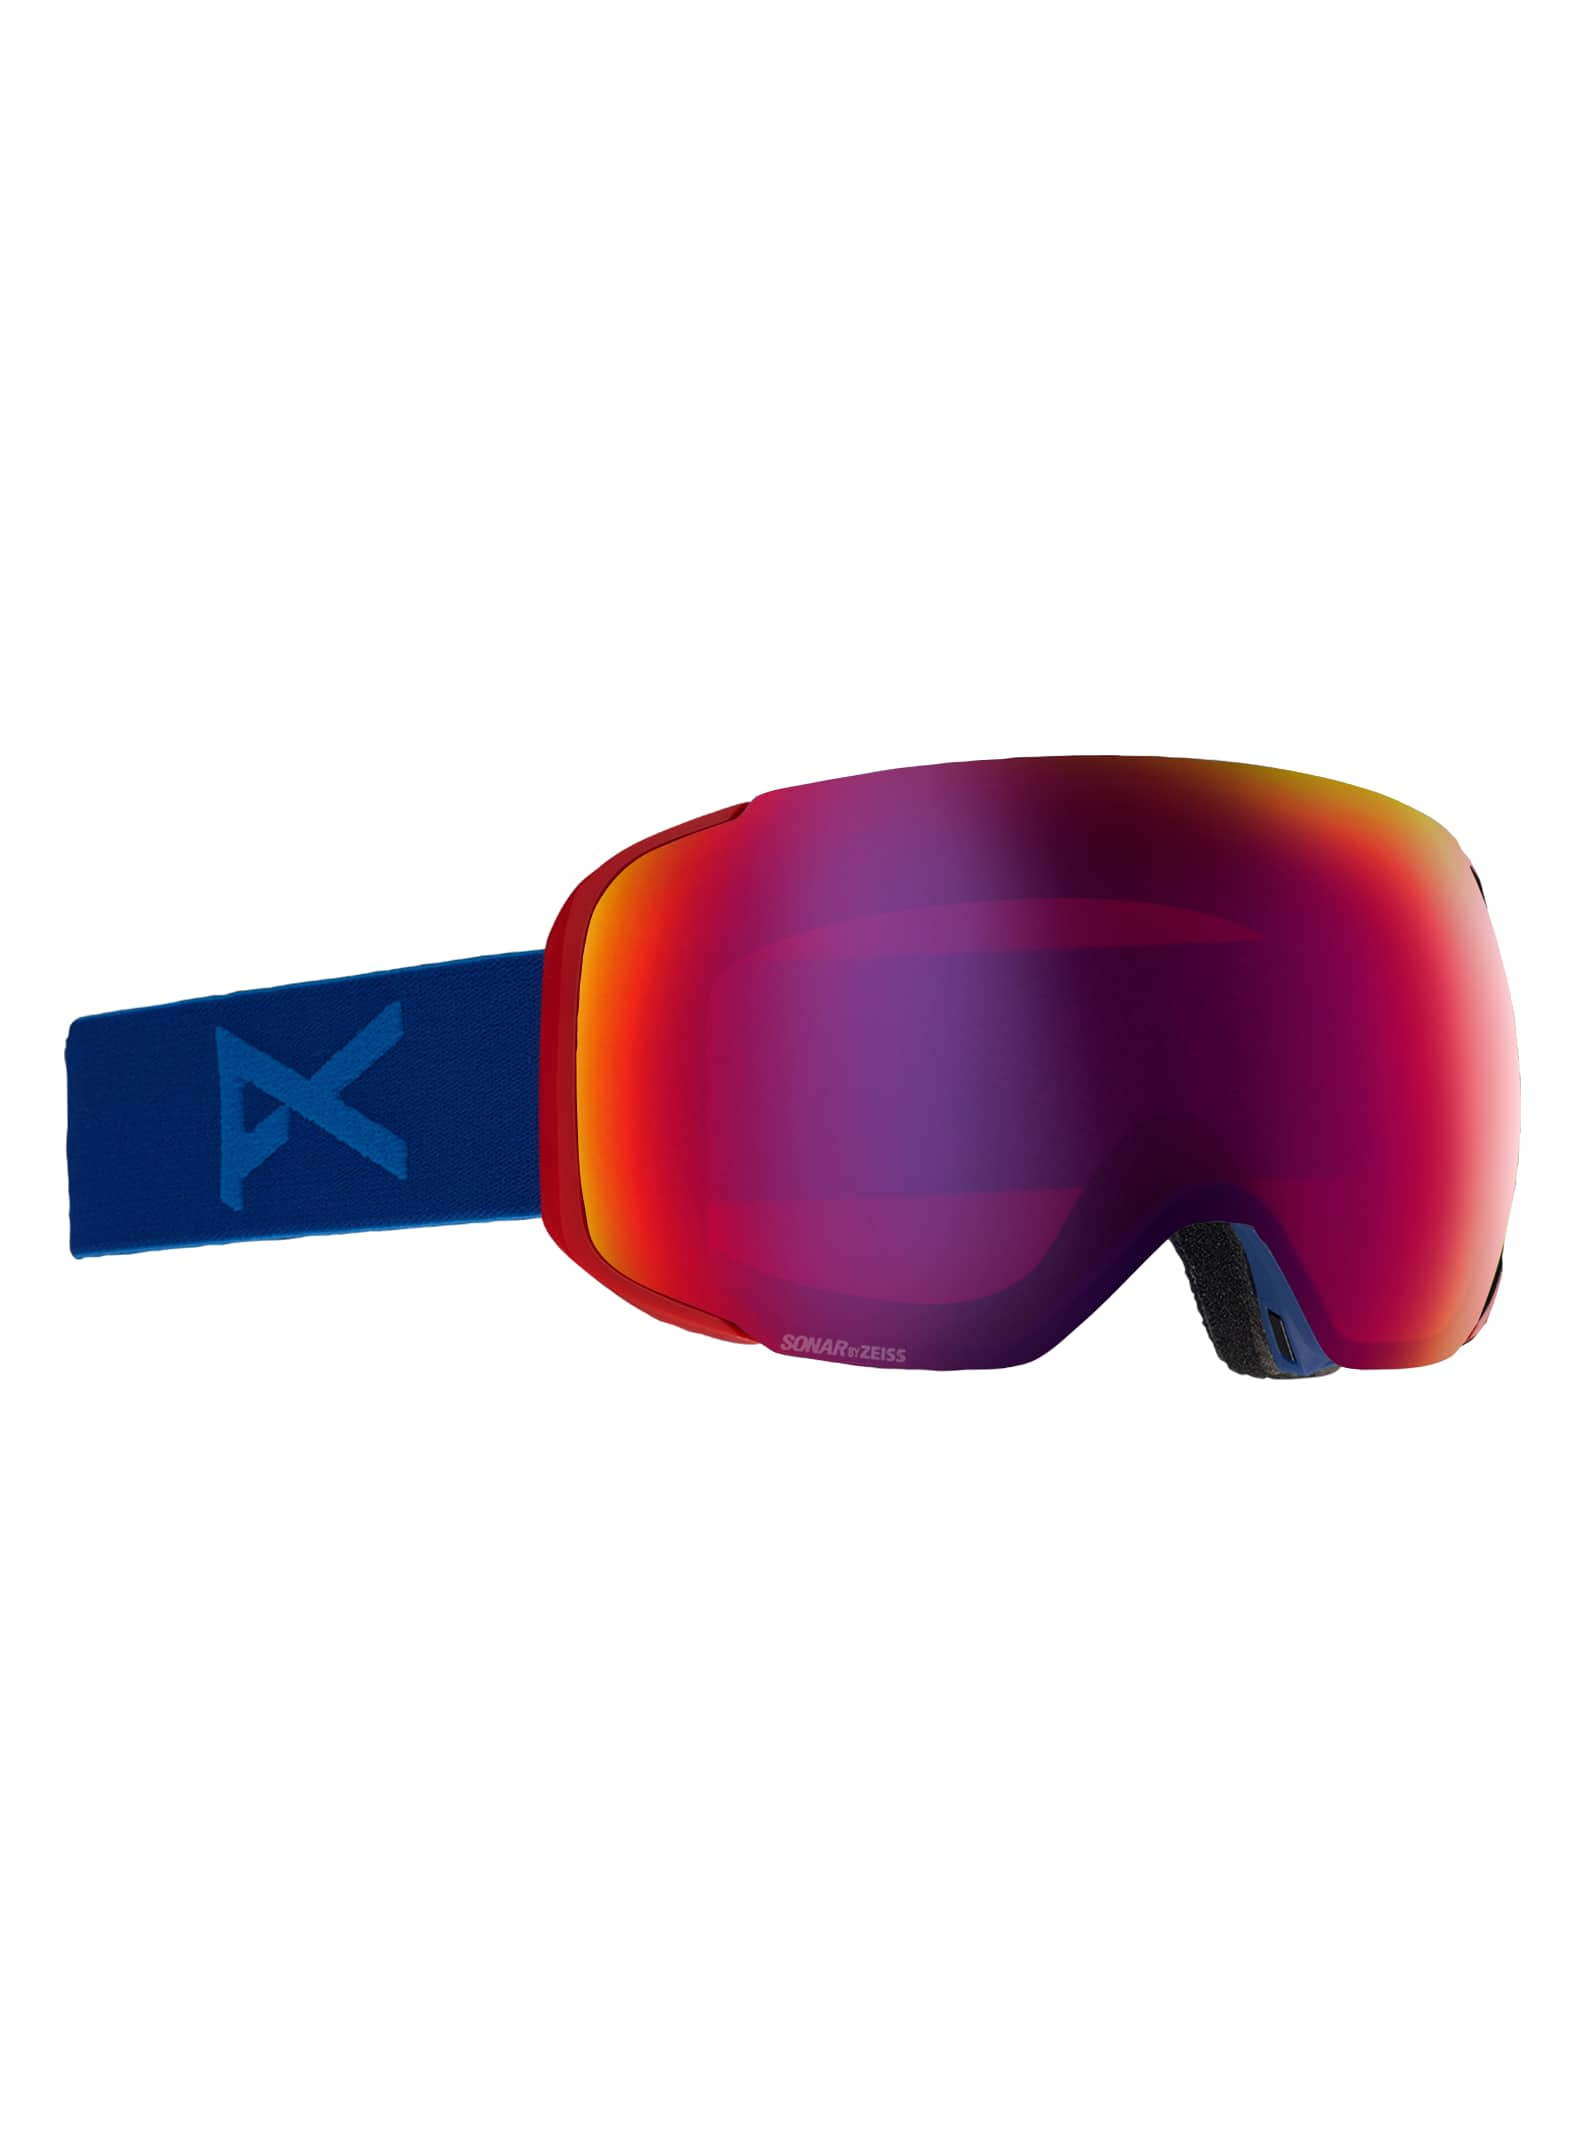 053d6240bc Men s Snowboard and Ski Goggles   Lenses